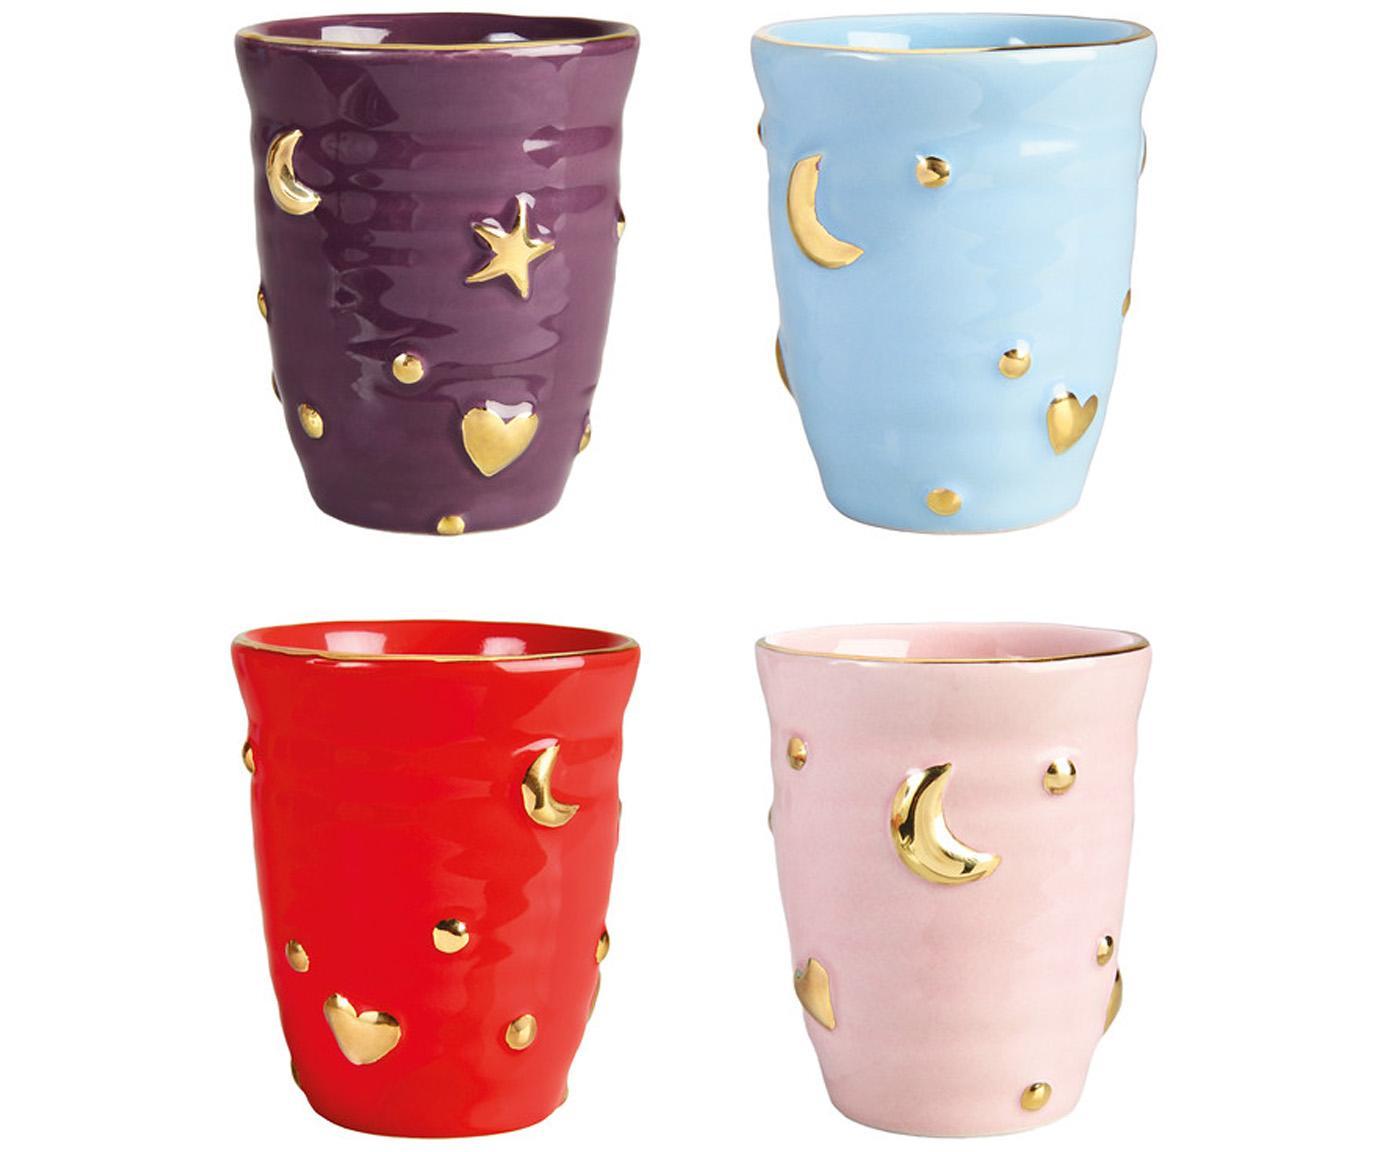 Set de tazas artesanales Anouk, 4pzas., Porcelana, Lila, azul claro, rojo, rosa, dorado, Ø 8 x Al 10 cm